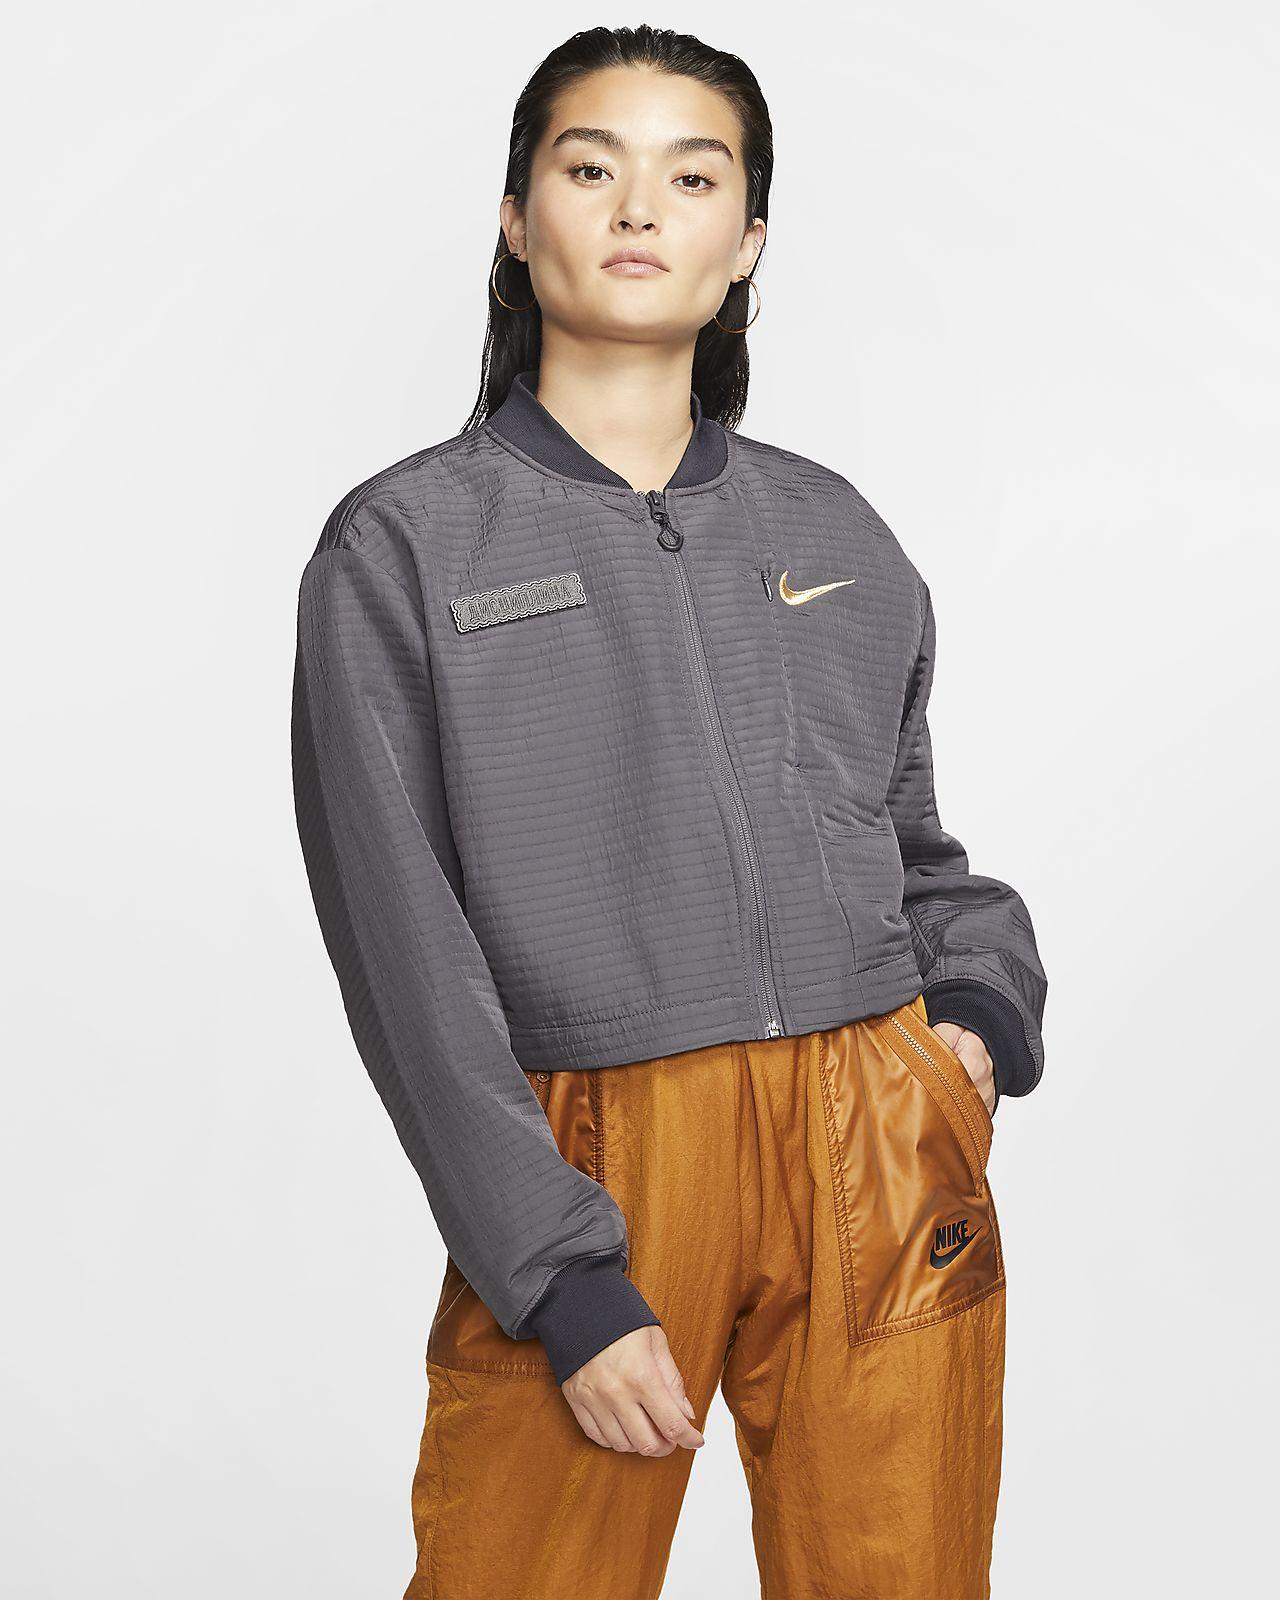 Nike Sportswear Maria Sharapova x La Cortez Women's Bomber